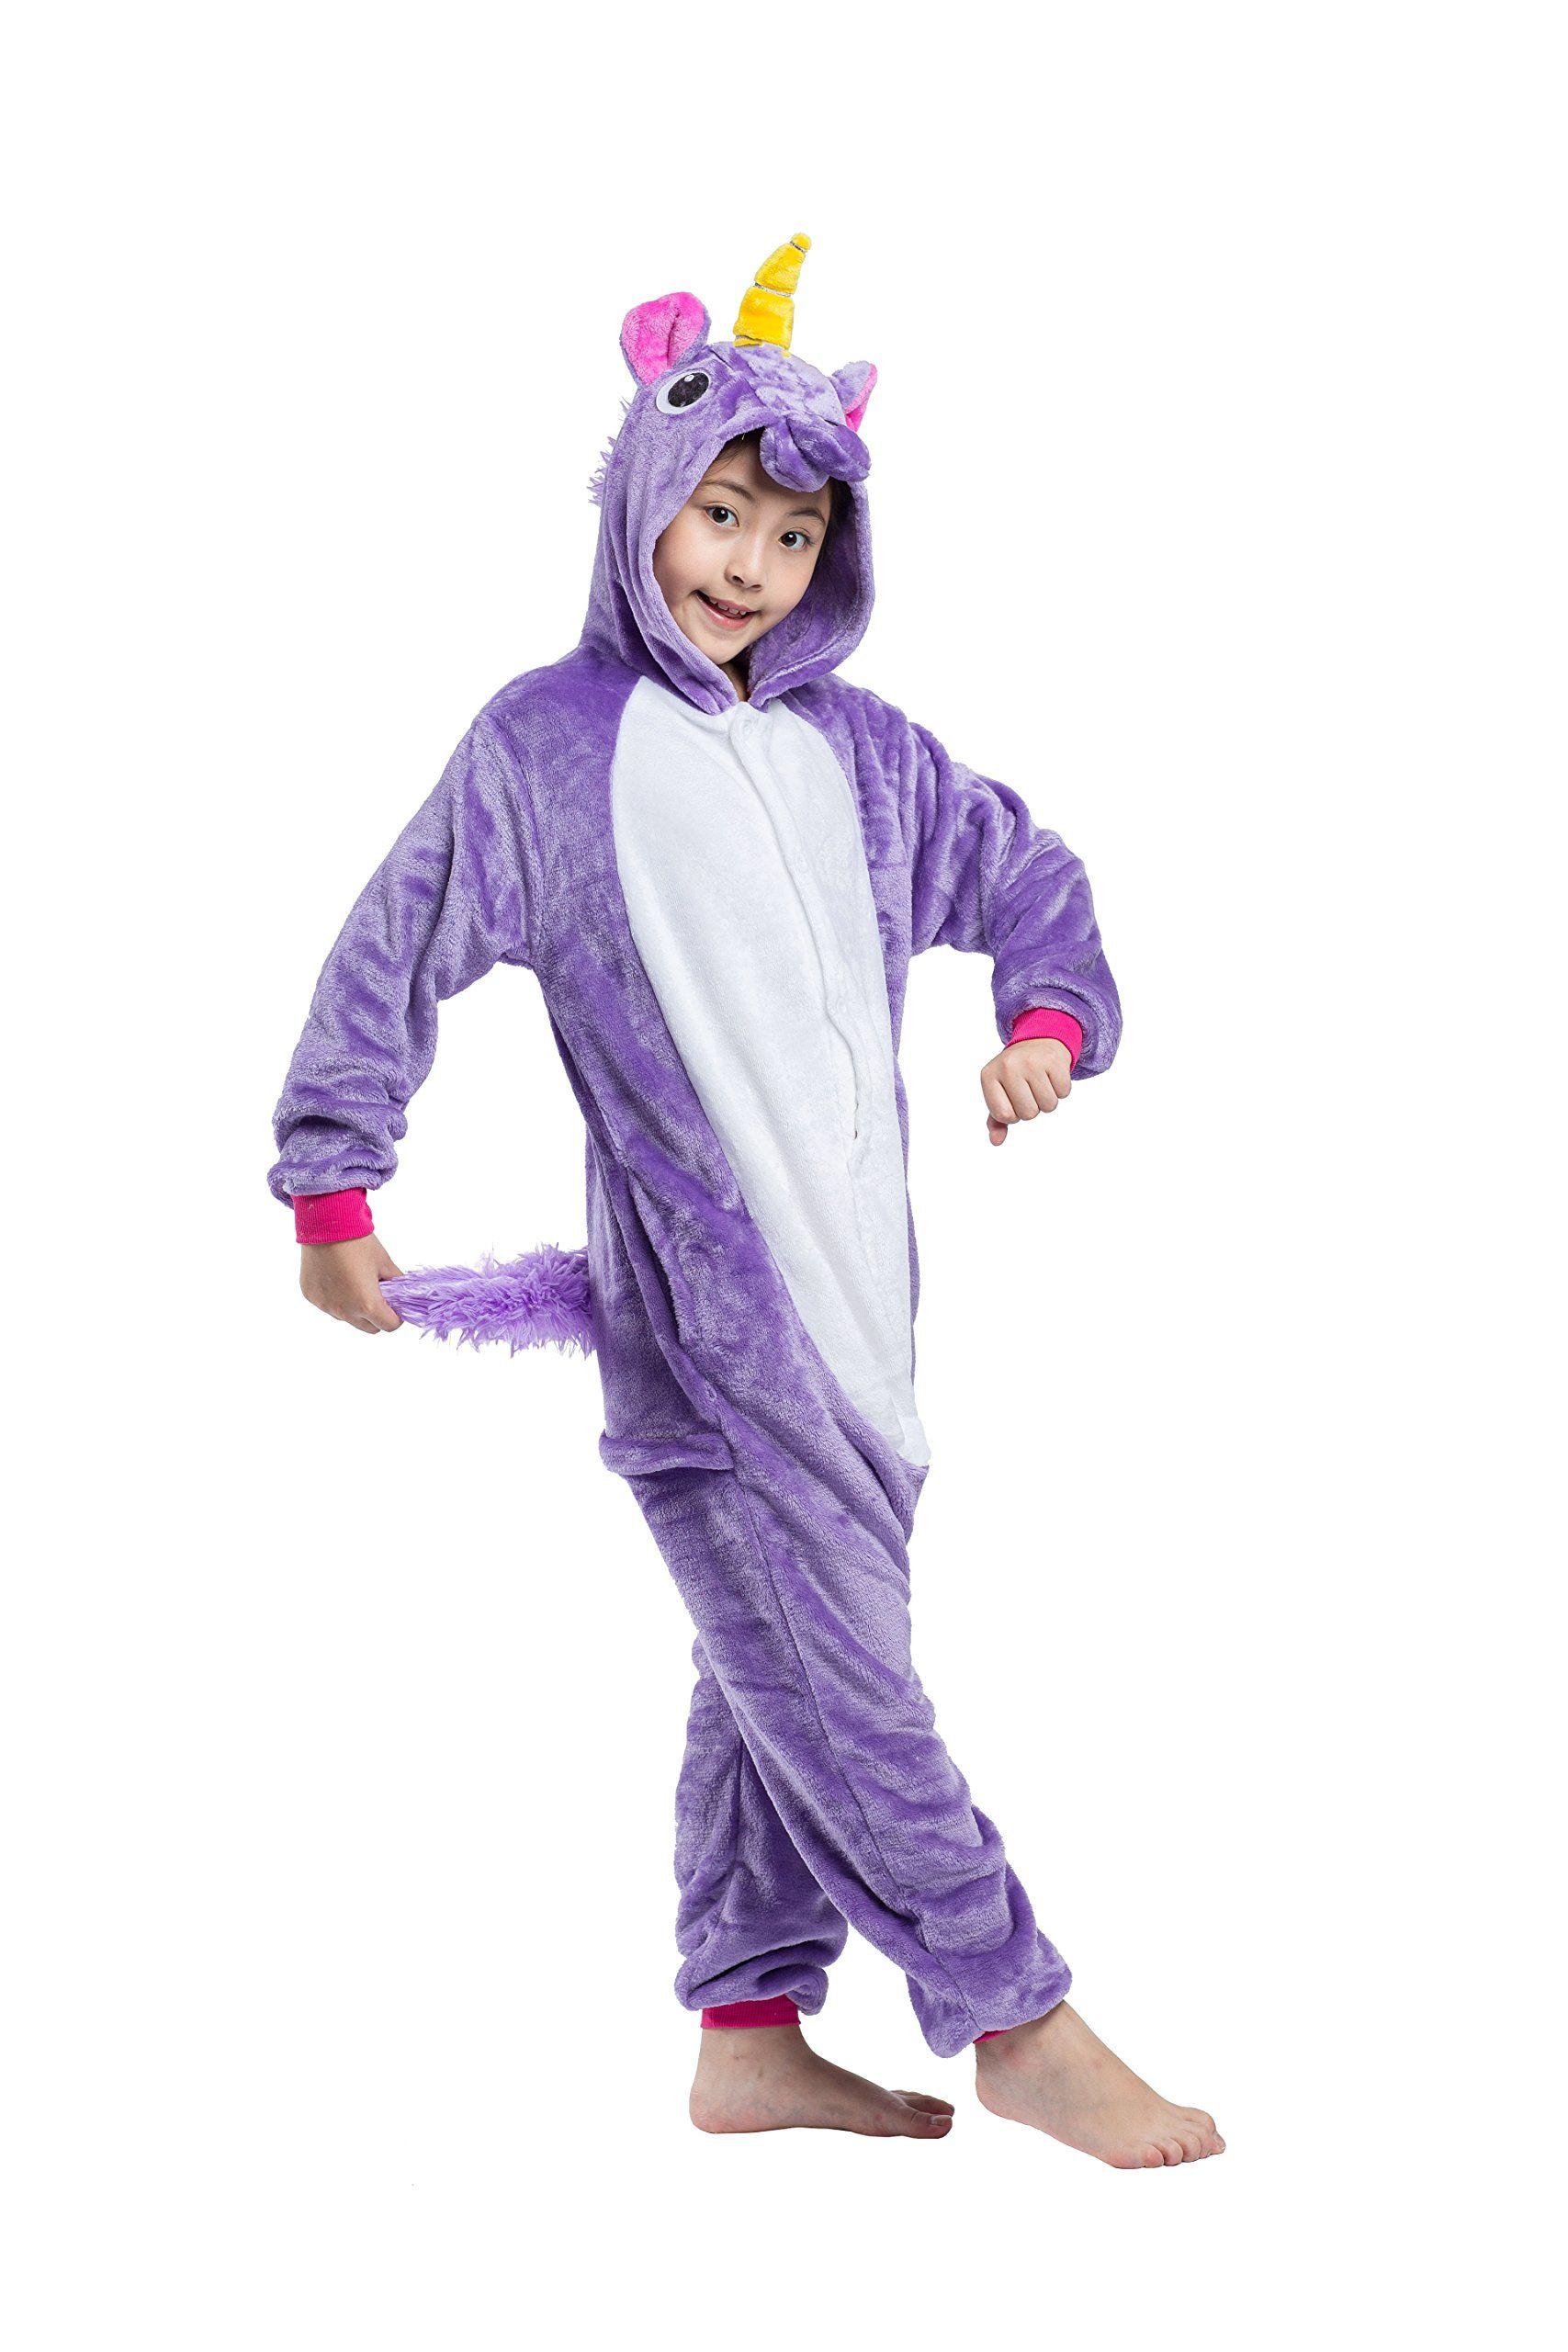 Yuwell Kids Unicorn Onesie Pajama Sleepwear Cosplay Costume Take A Look At The Photo By Visiting The L Onesie Costumes Unicorn Onesie Pajamas Animal Onesie